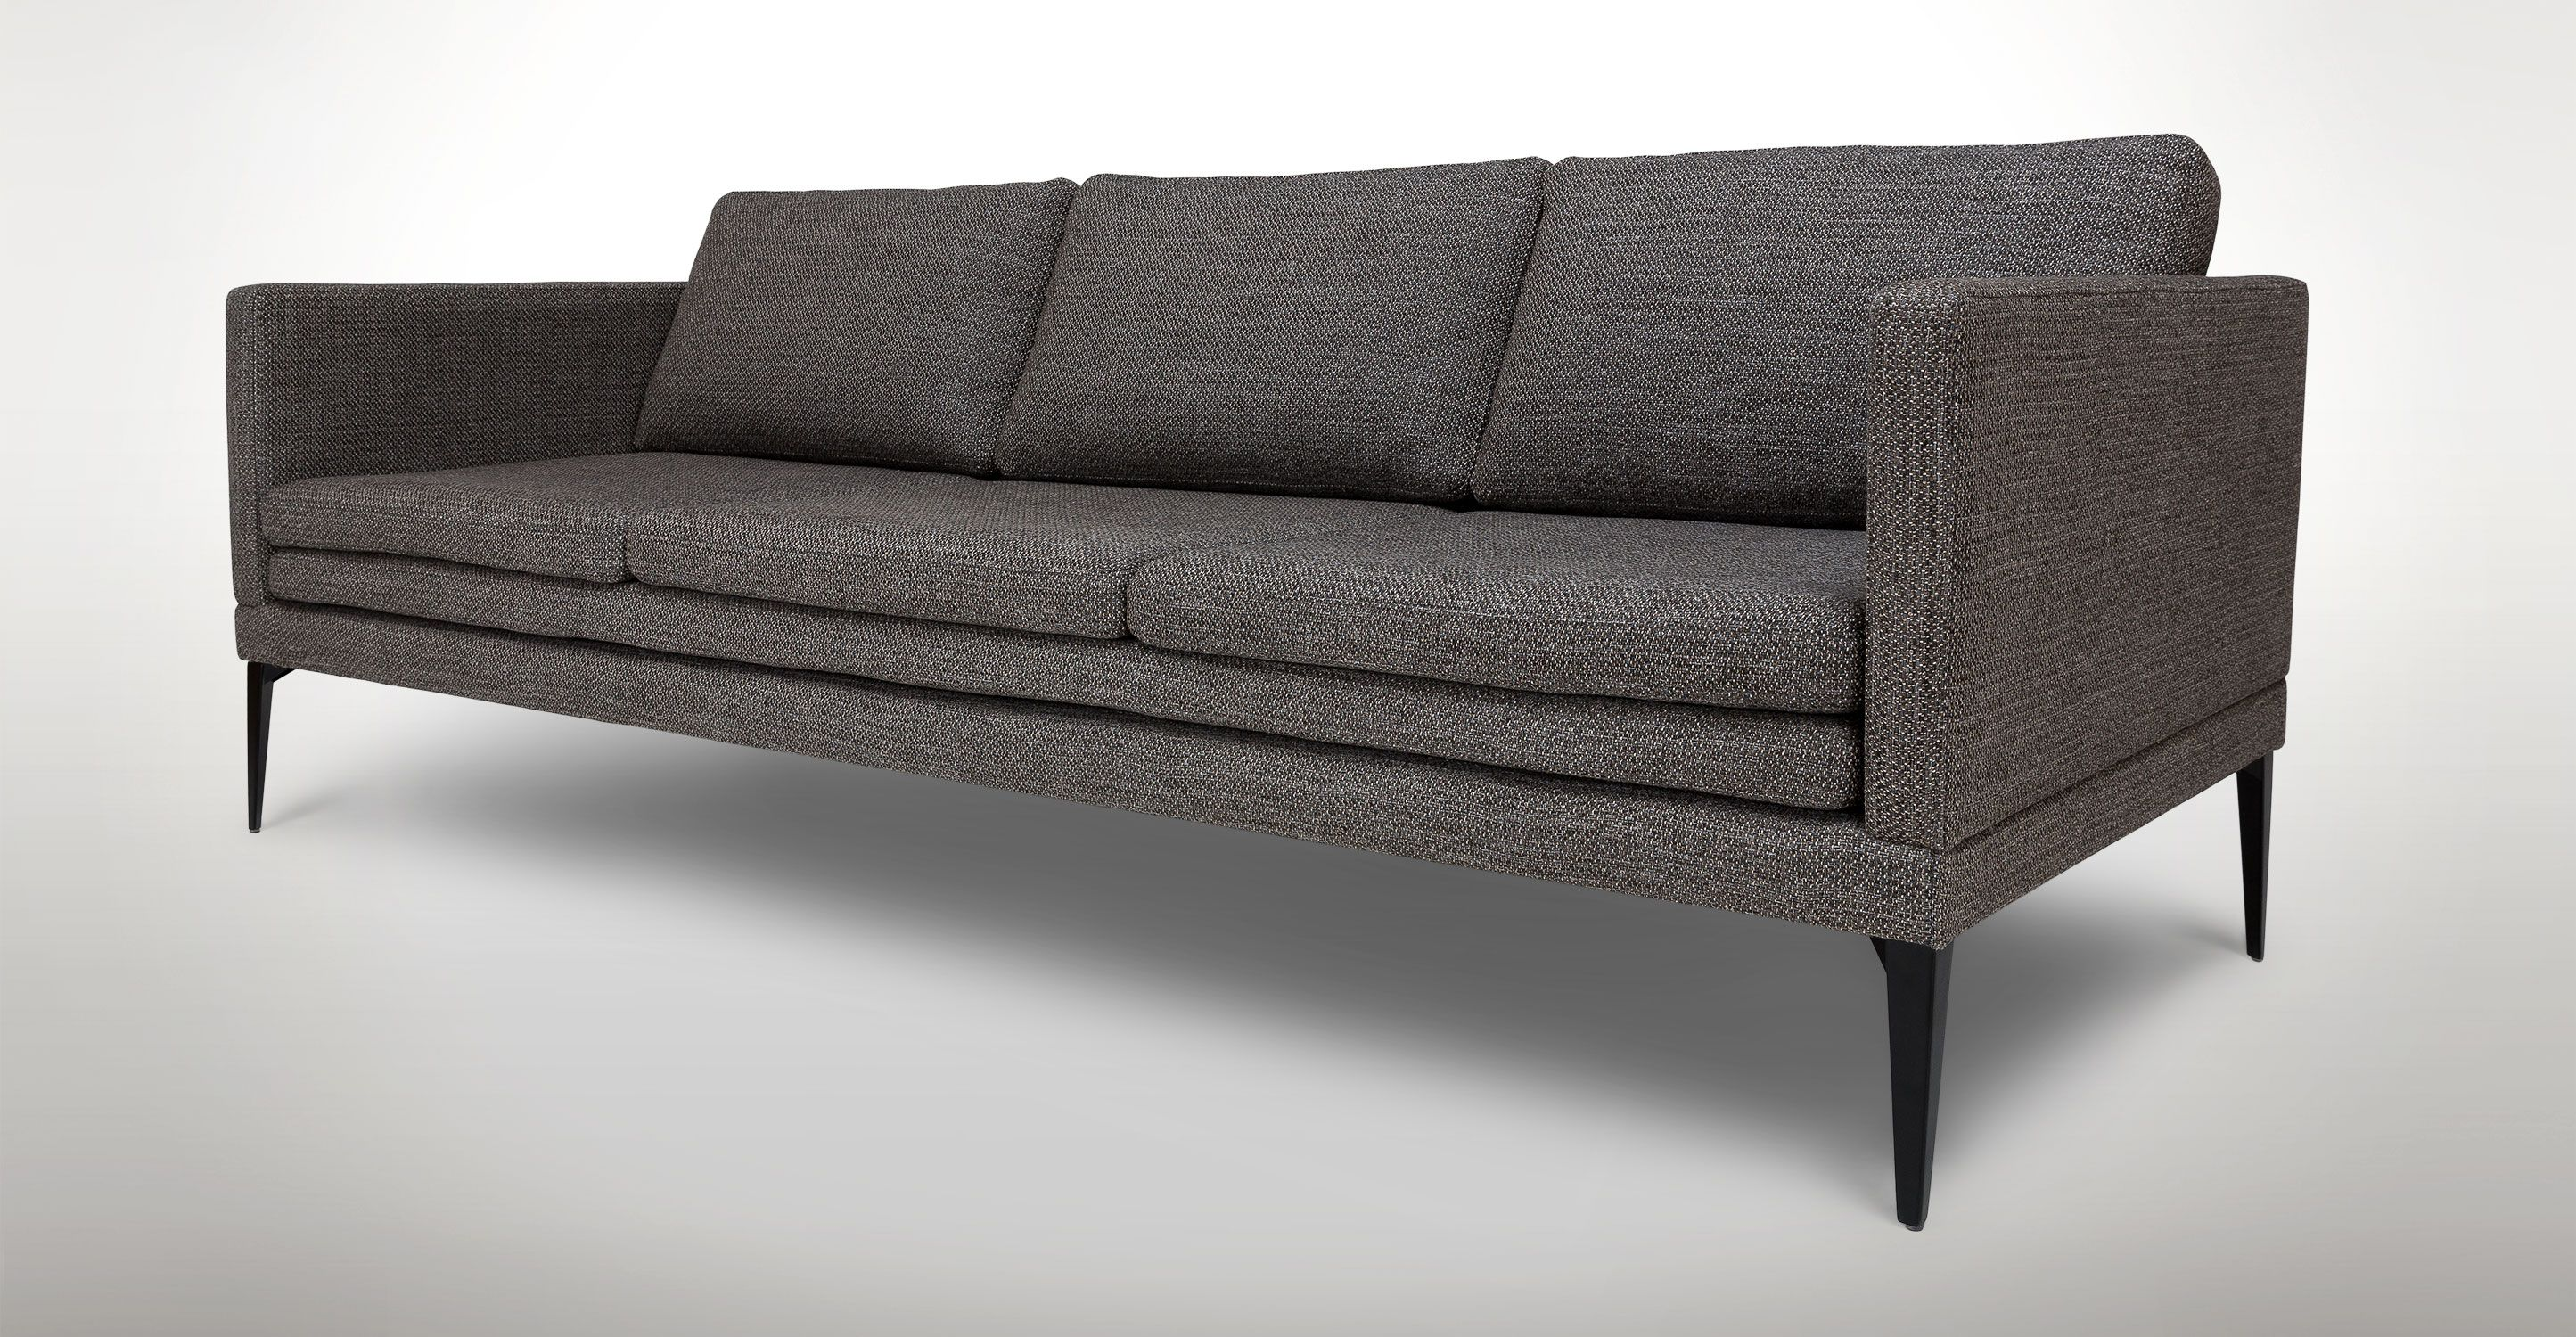 Triplo Meteorite Gray Sofa | Apartment | Gray sofa, Sofa furniture, Sofa